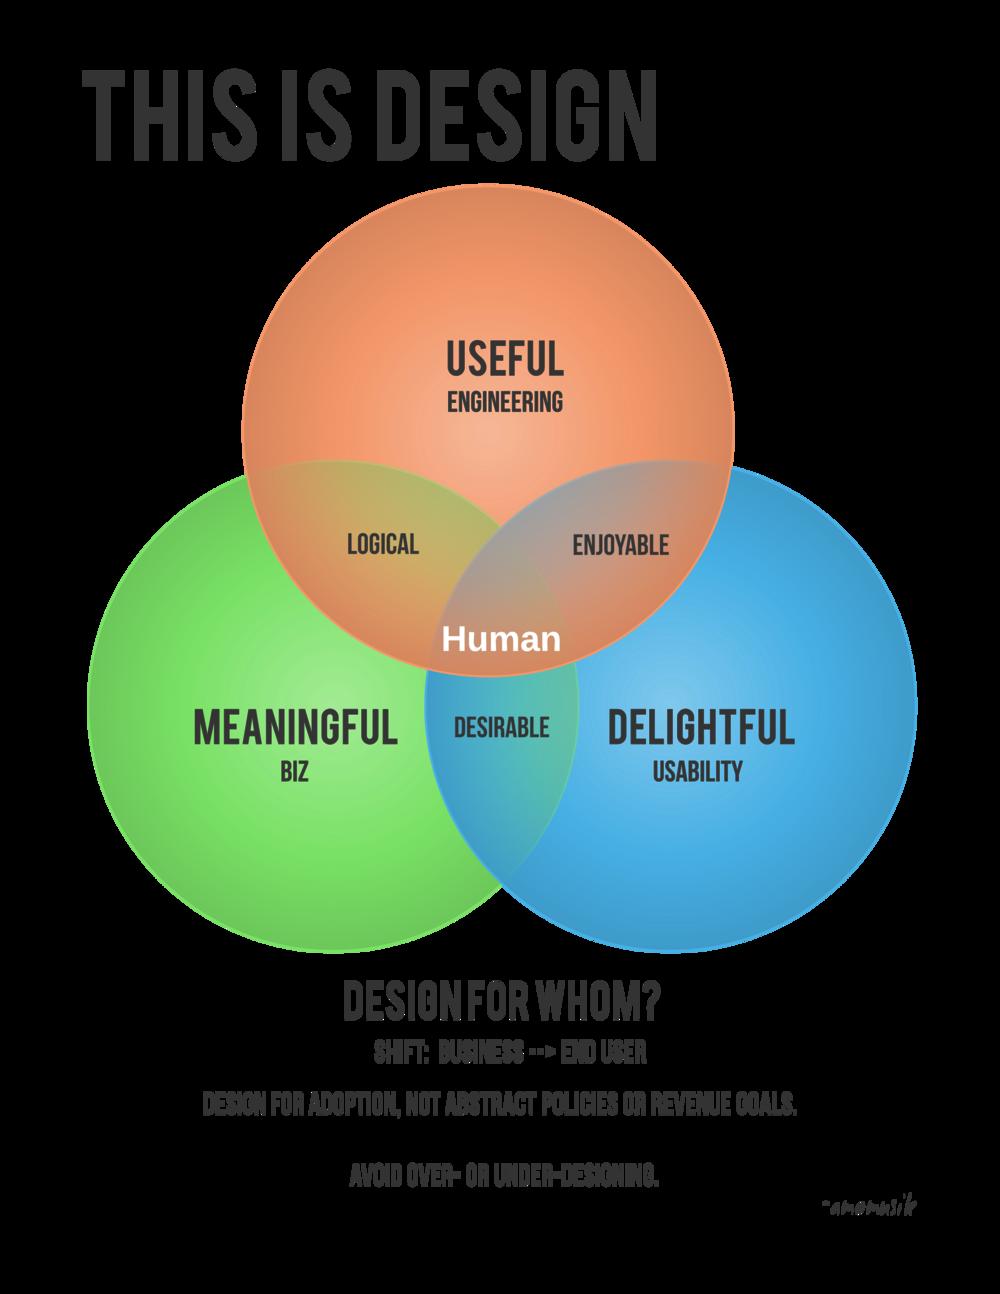 design definition | productdesignblog